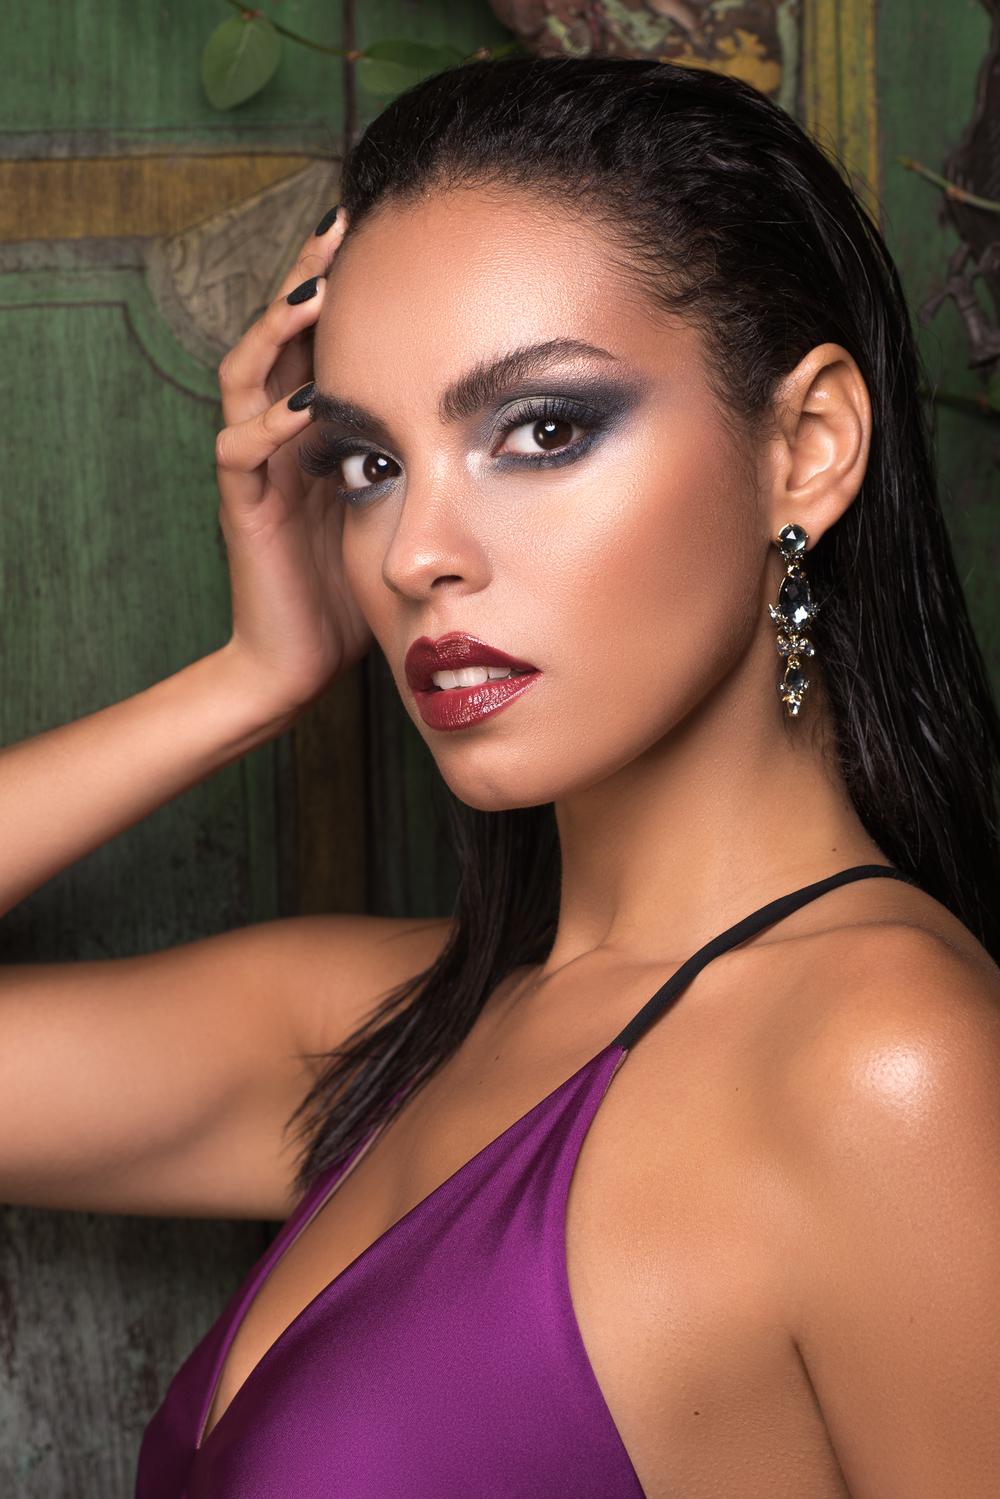 Los Angeles Beauty photographer - Beatriz jungle beauty 03.jpg